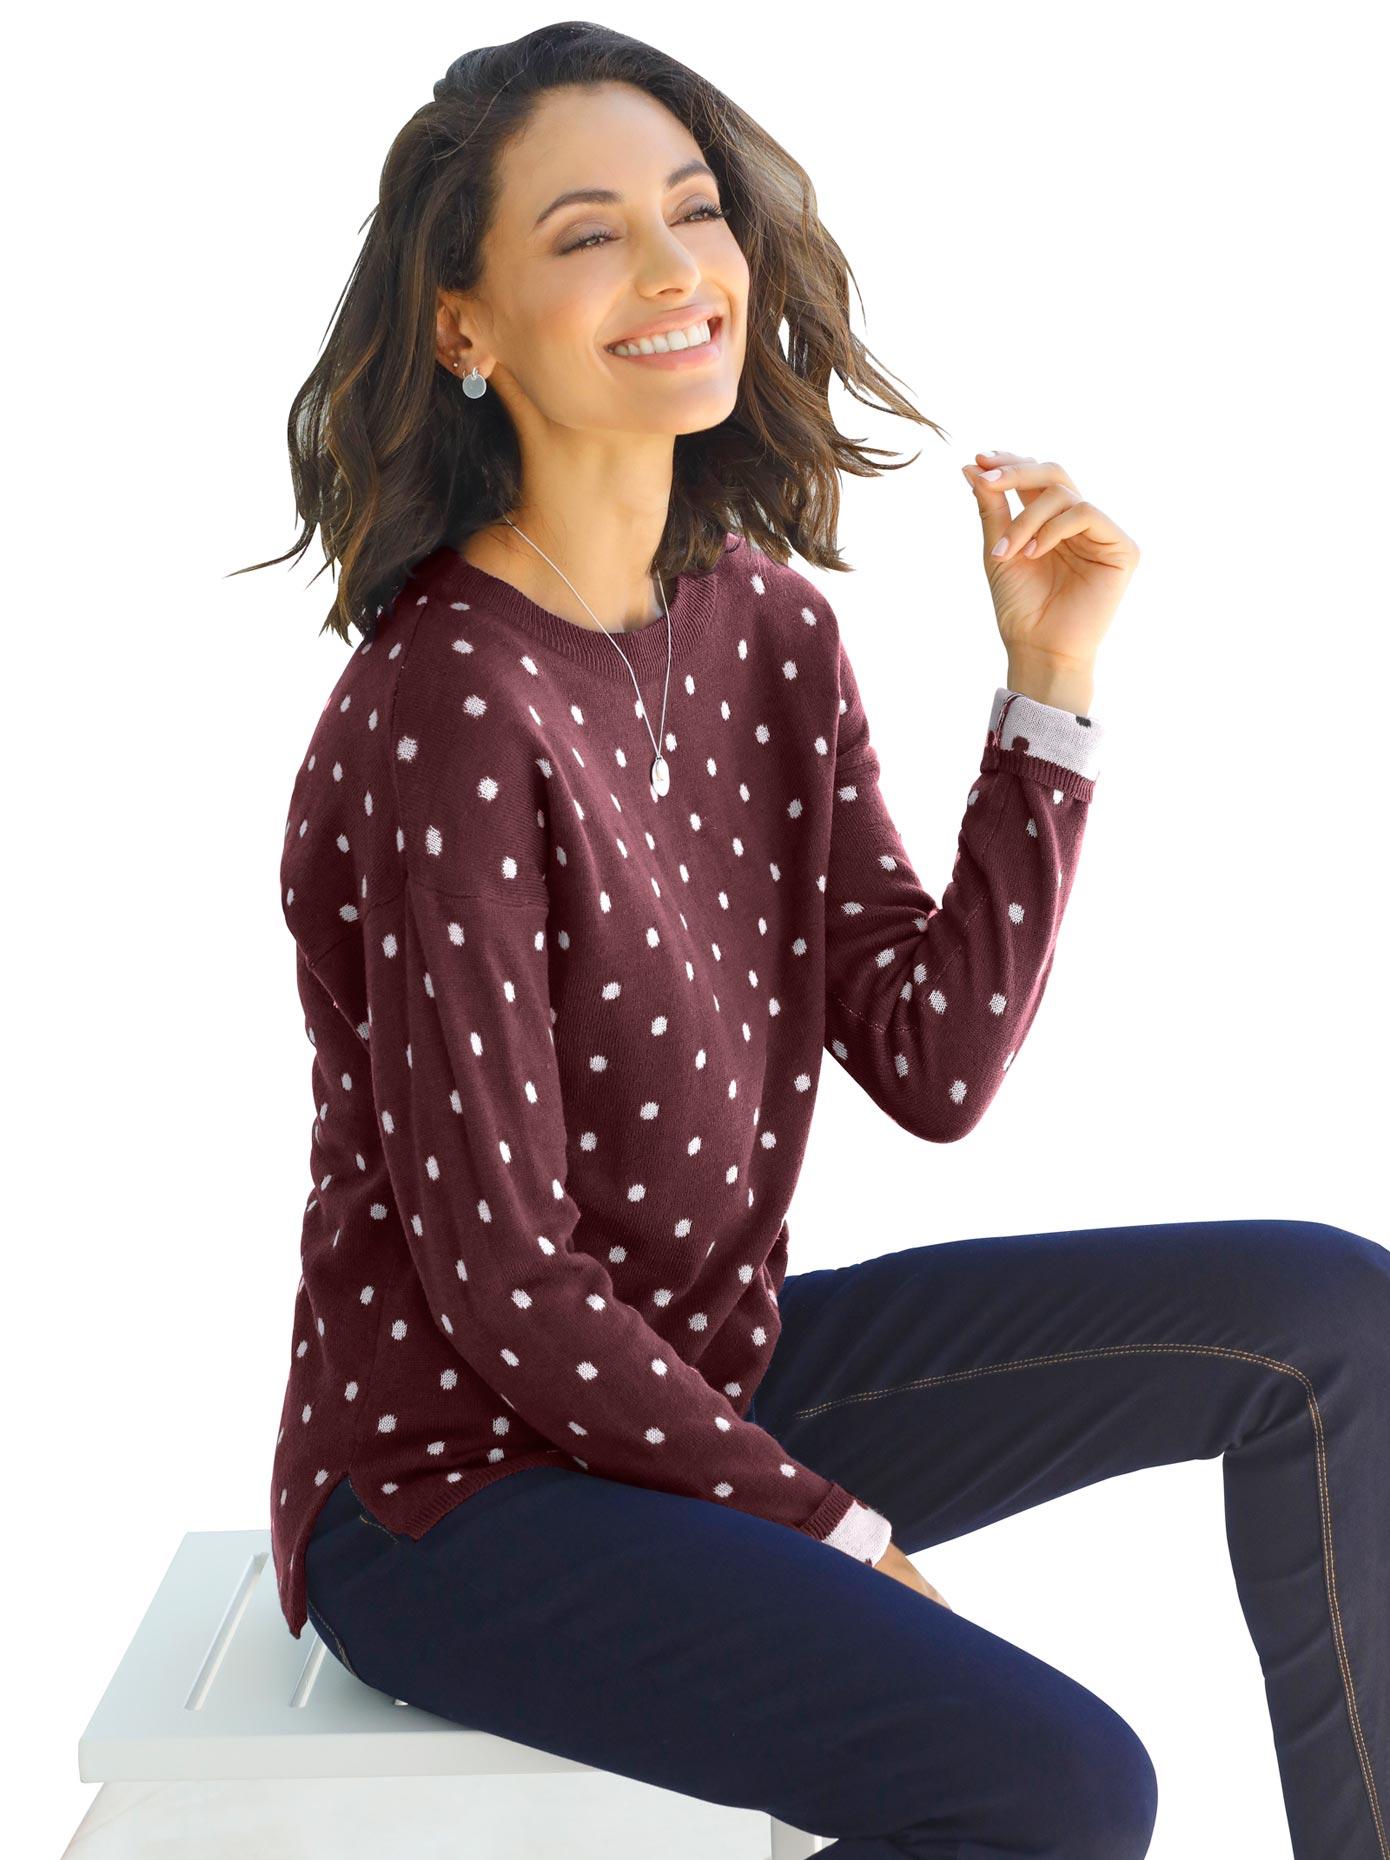 classic inspirationen -  Pullover in hochwertigem Tupfen-Jacquardmuster